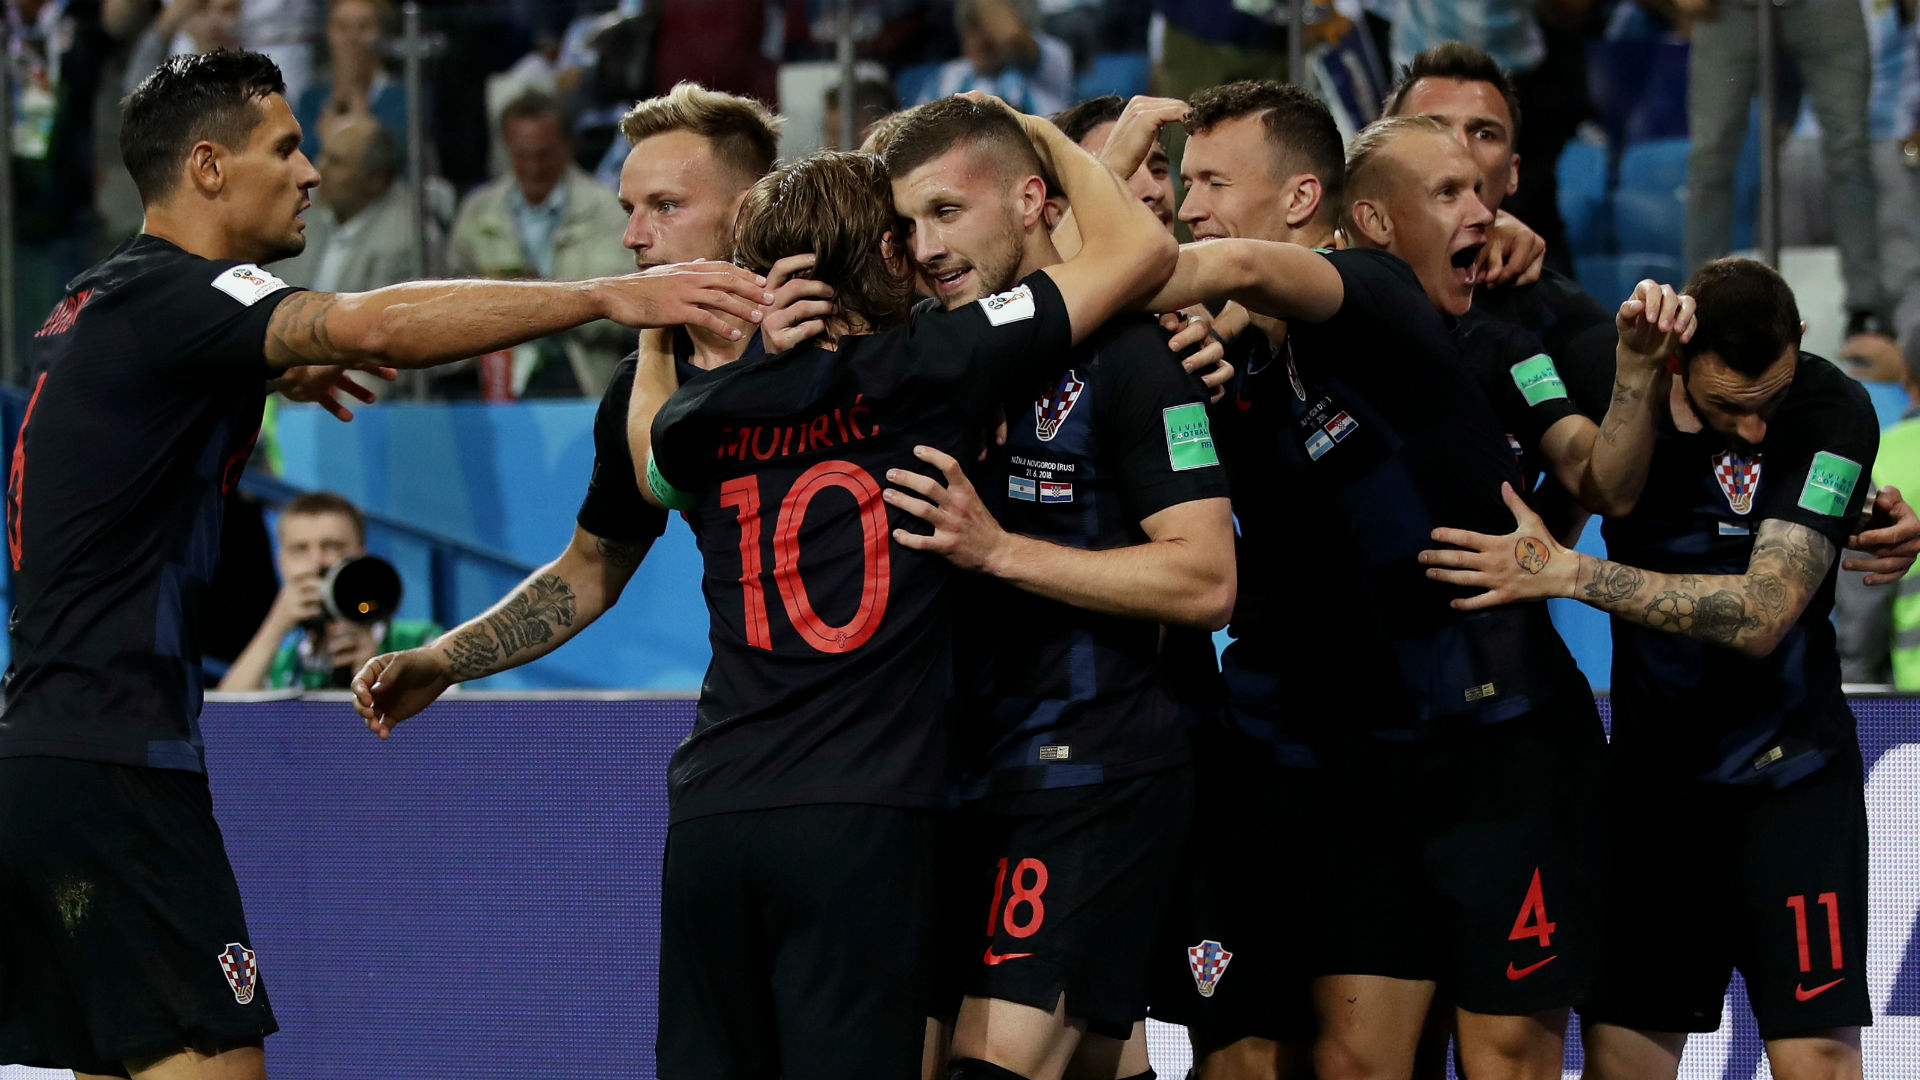 https://images.performgroup.com/di/library/GOAL/db/b1/croatia-argentina-world-cup-2018_pi2h5l9kk0p147x8o782vlip.jpg?t=597001468&quality=90&h=300